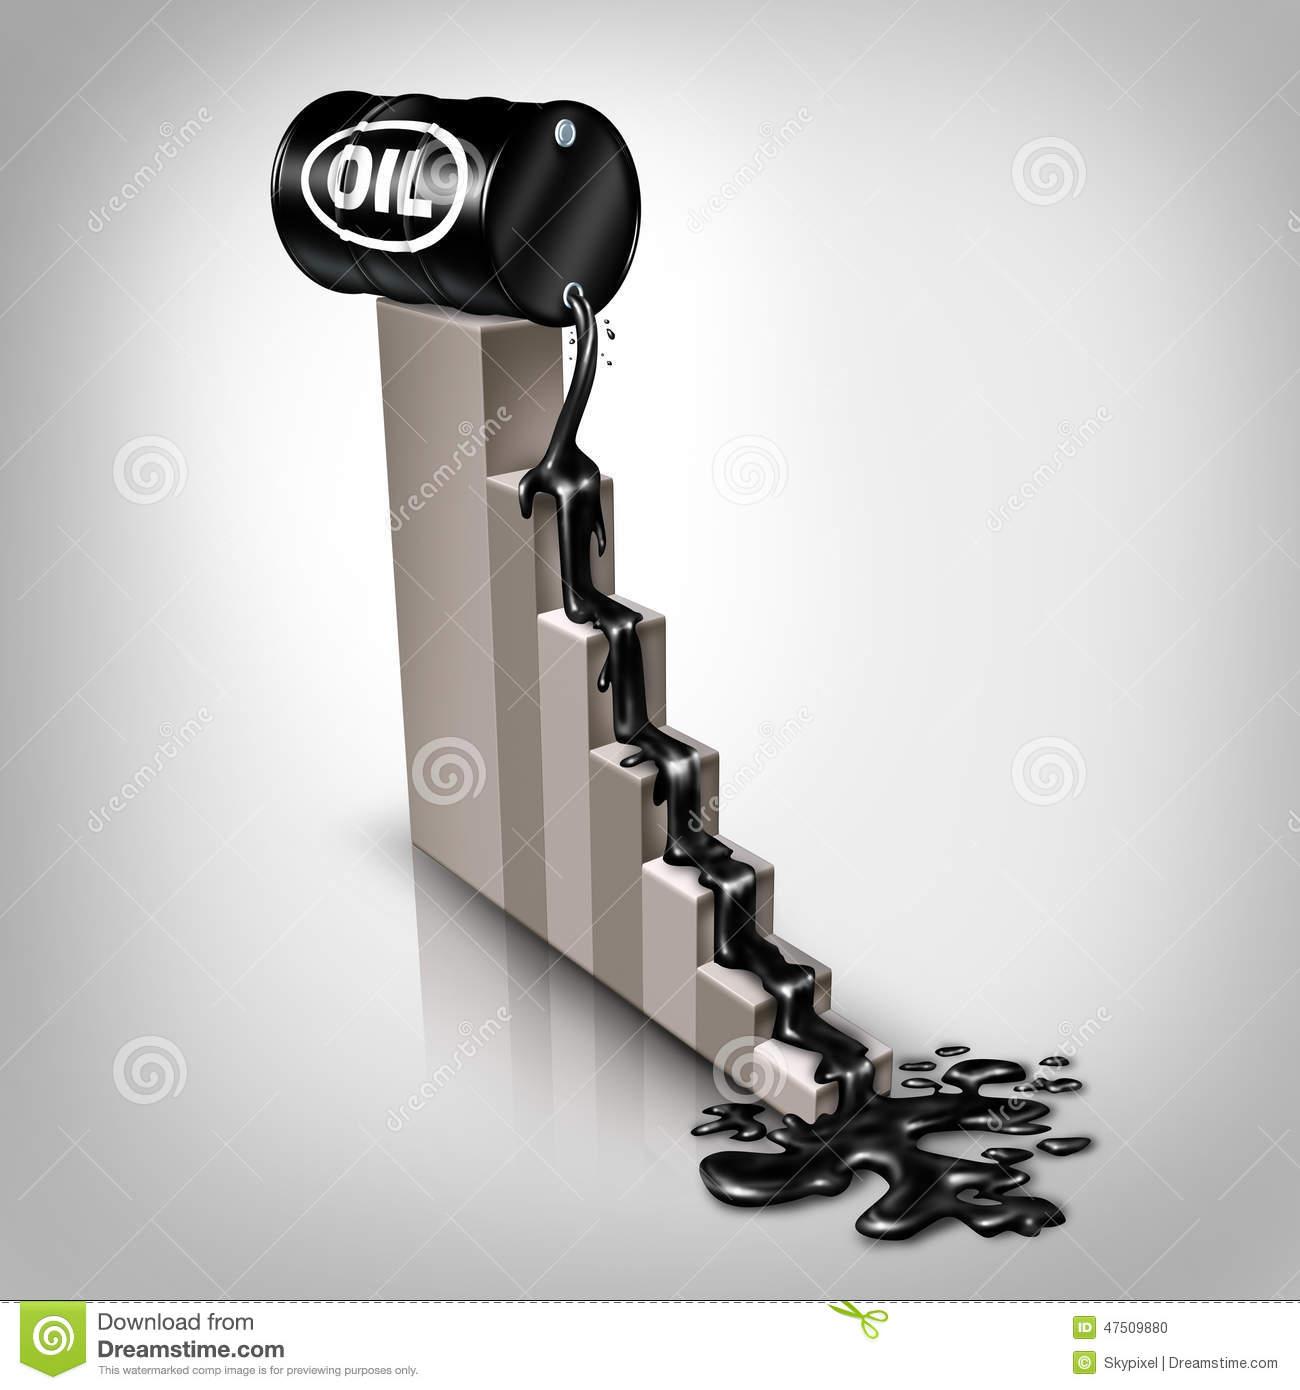 Oil Price Falling Stock Illustration.